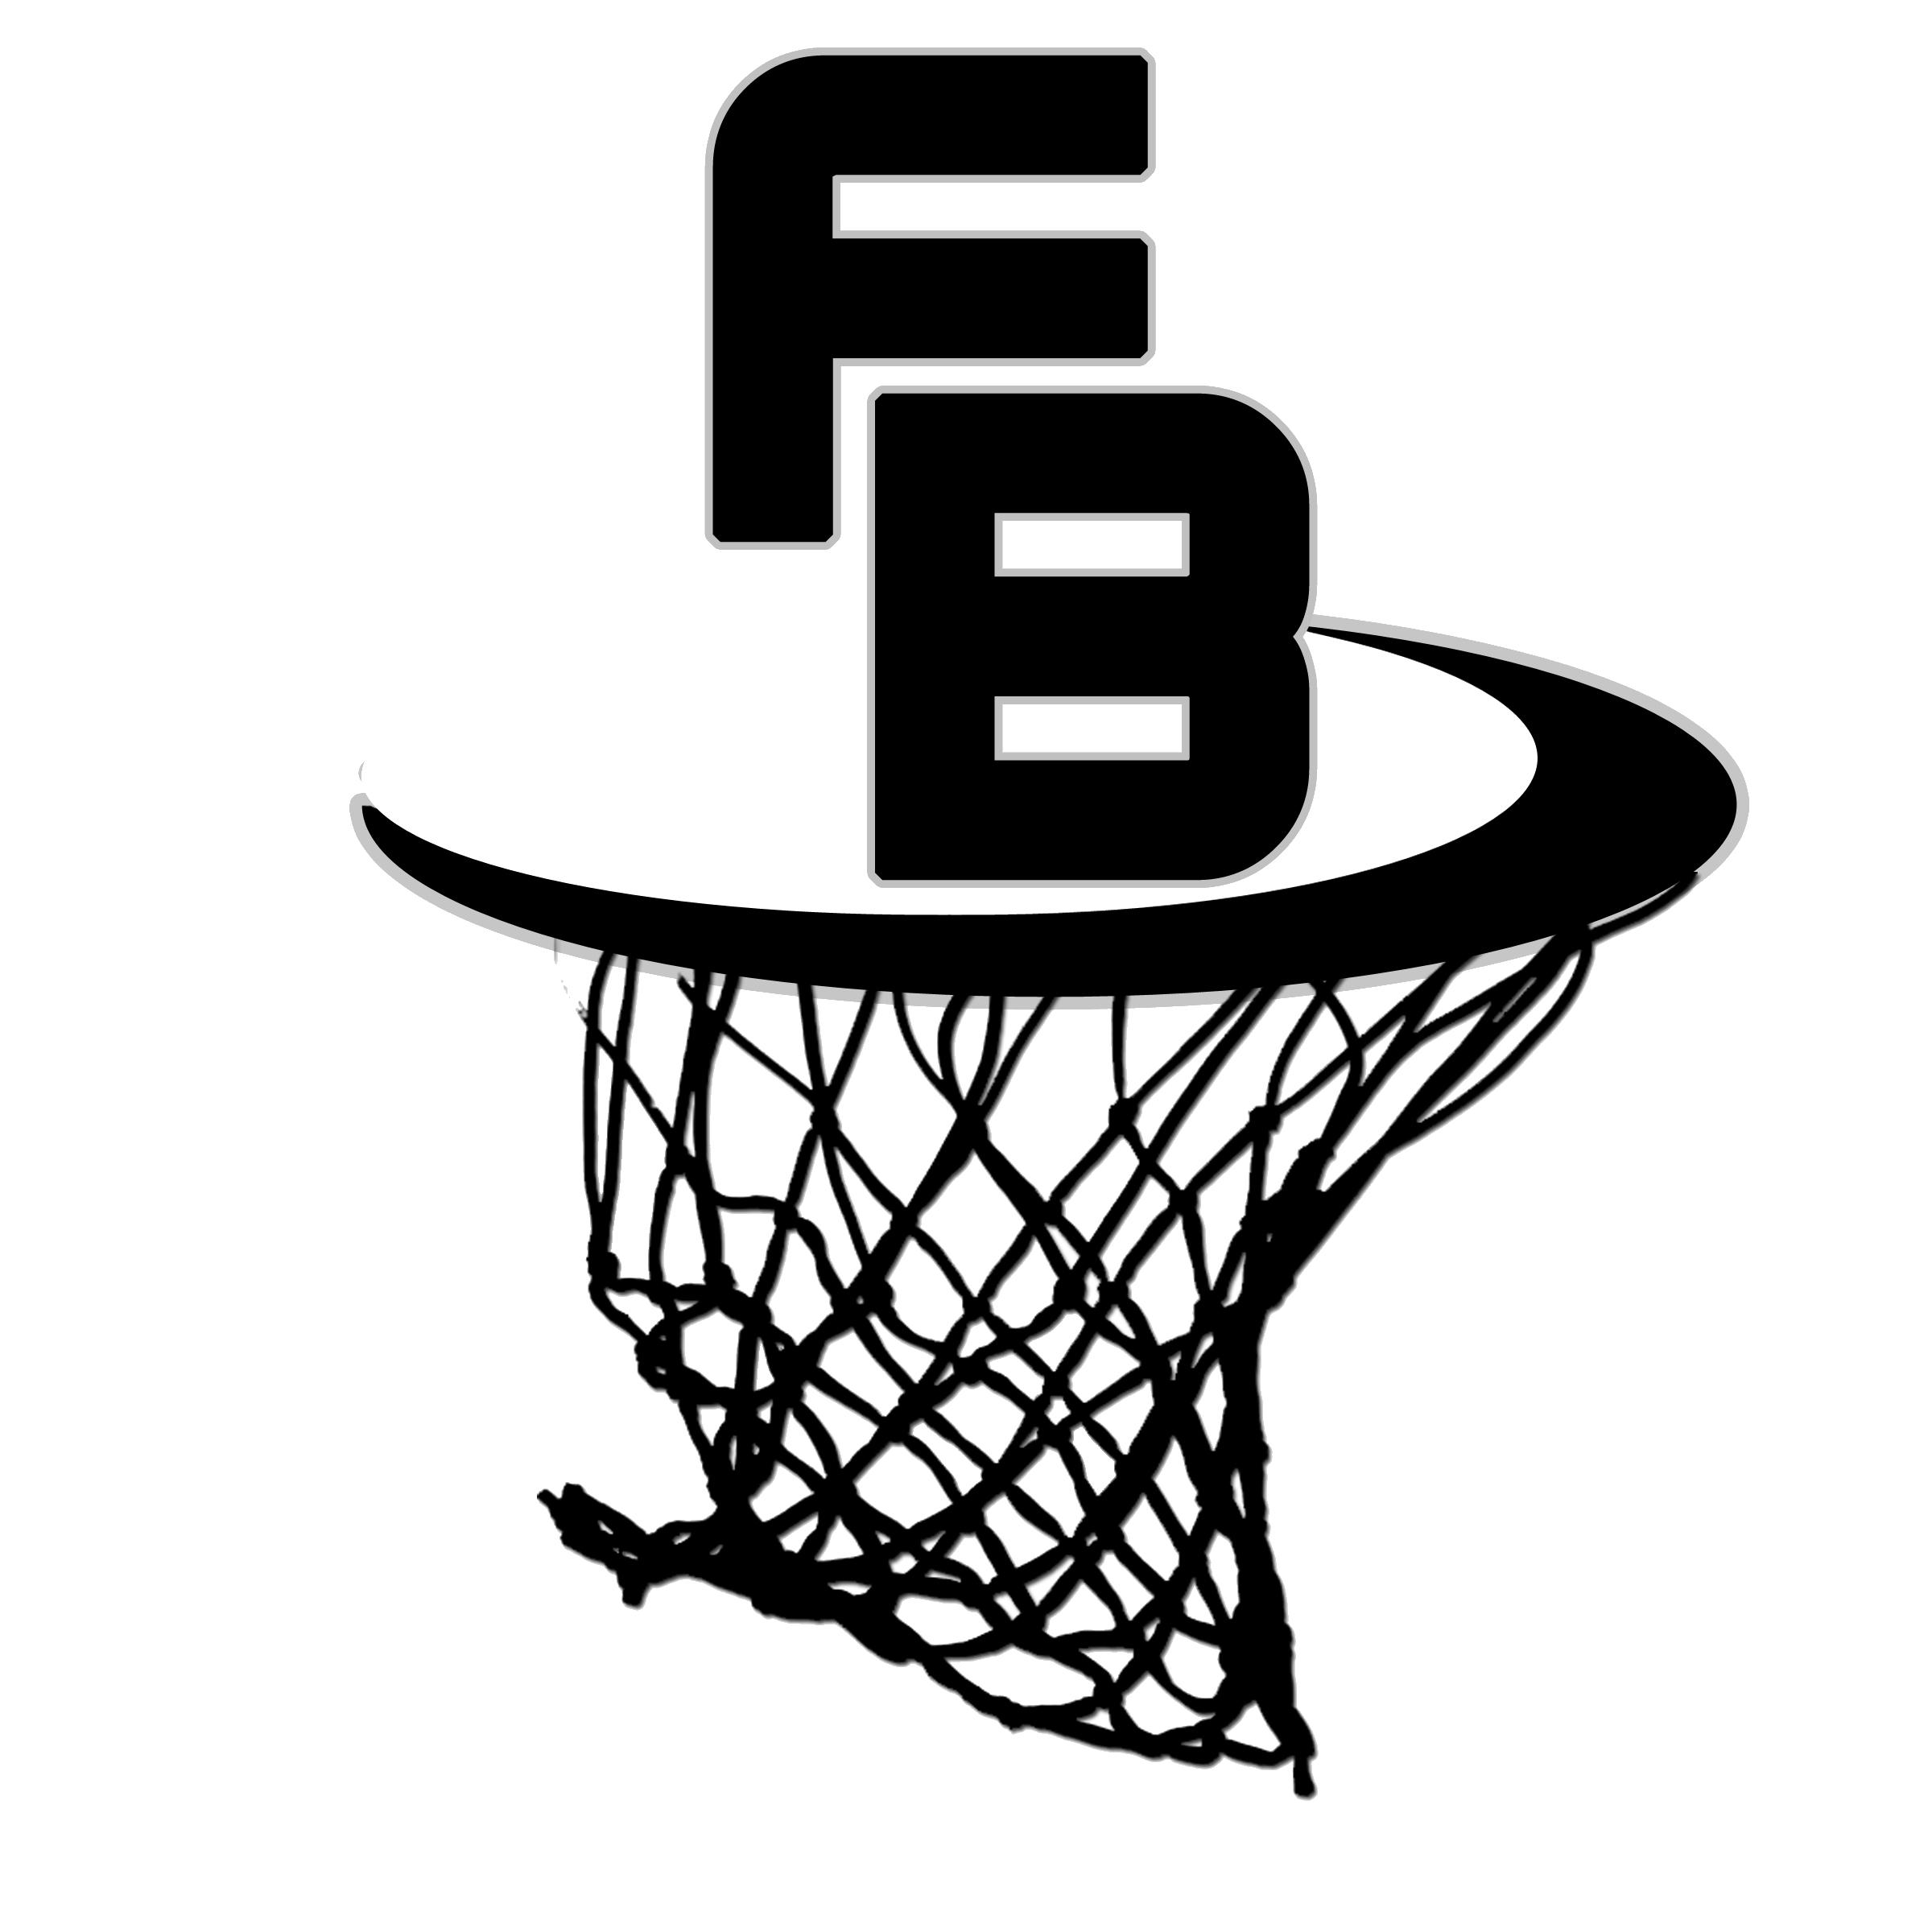 Basketball Net Vector | Clipart Panda - Free Clipart Images